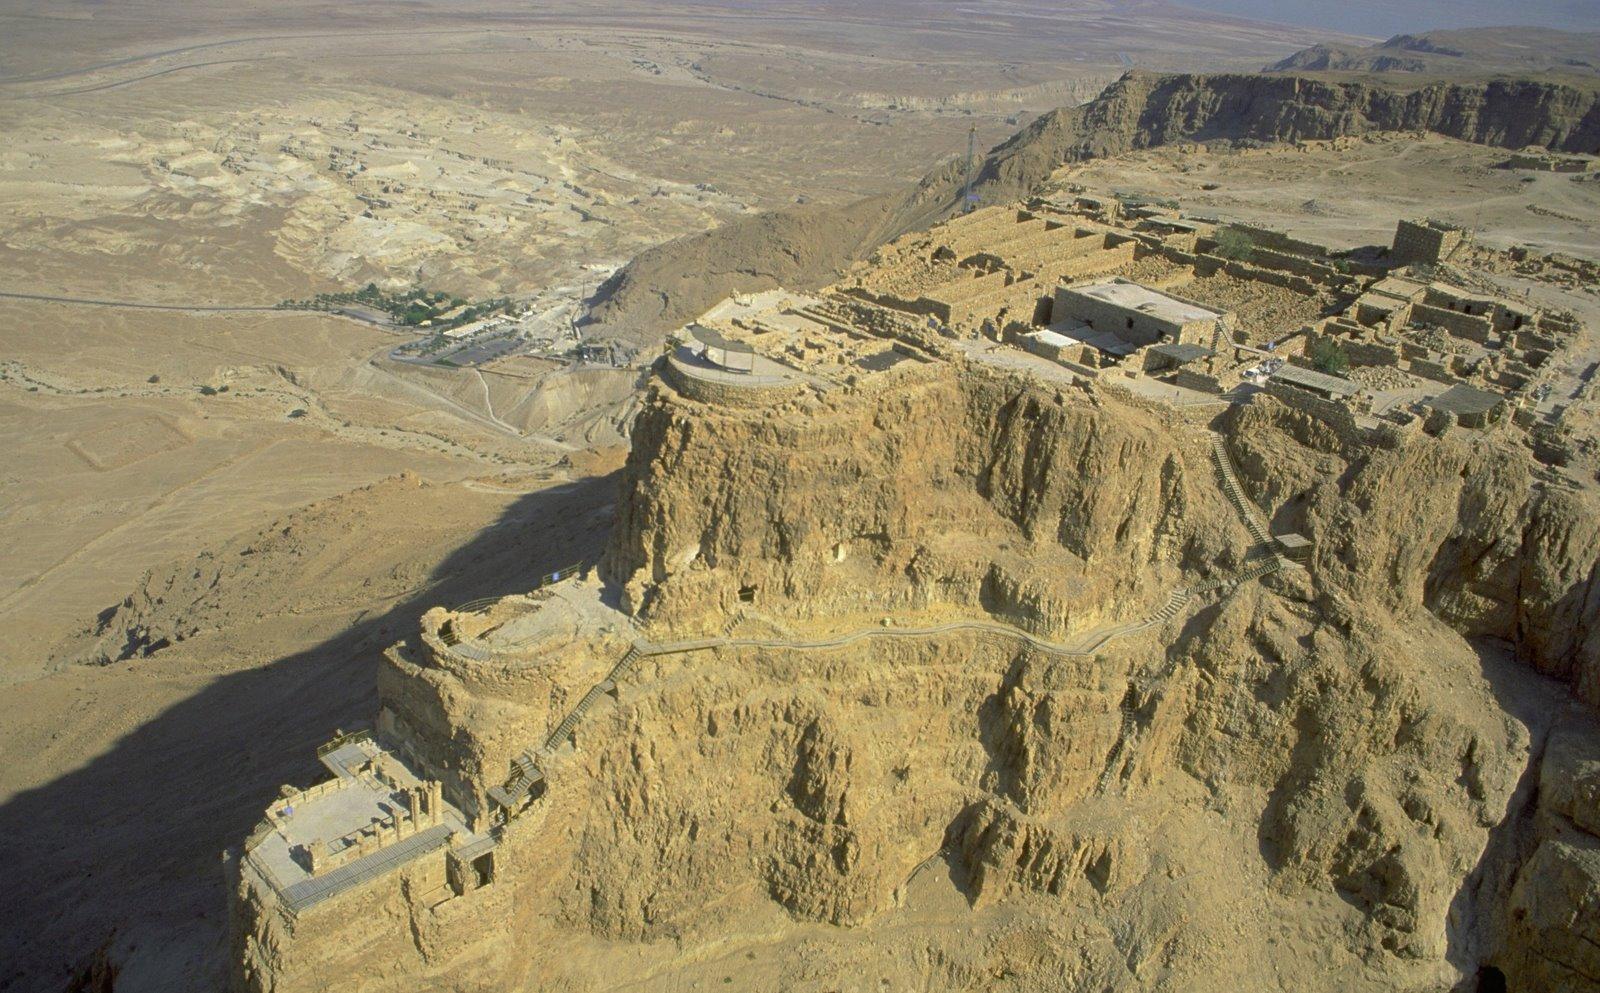 Masada, l'inespugnabile